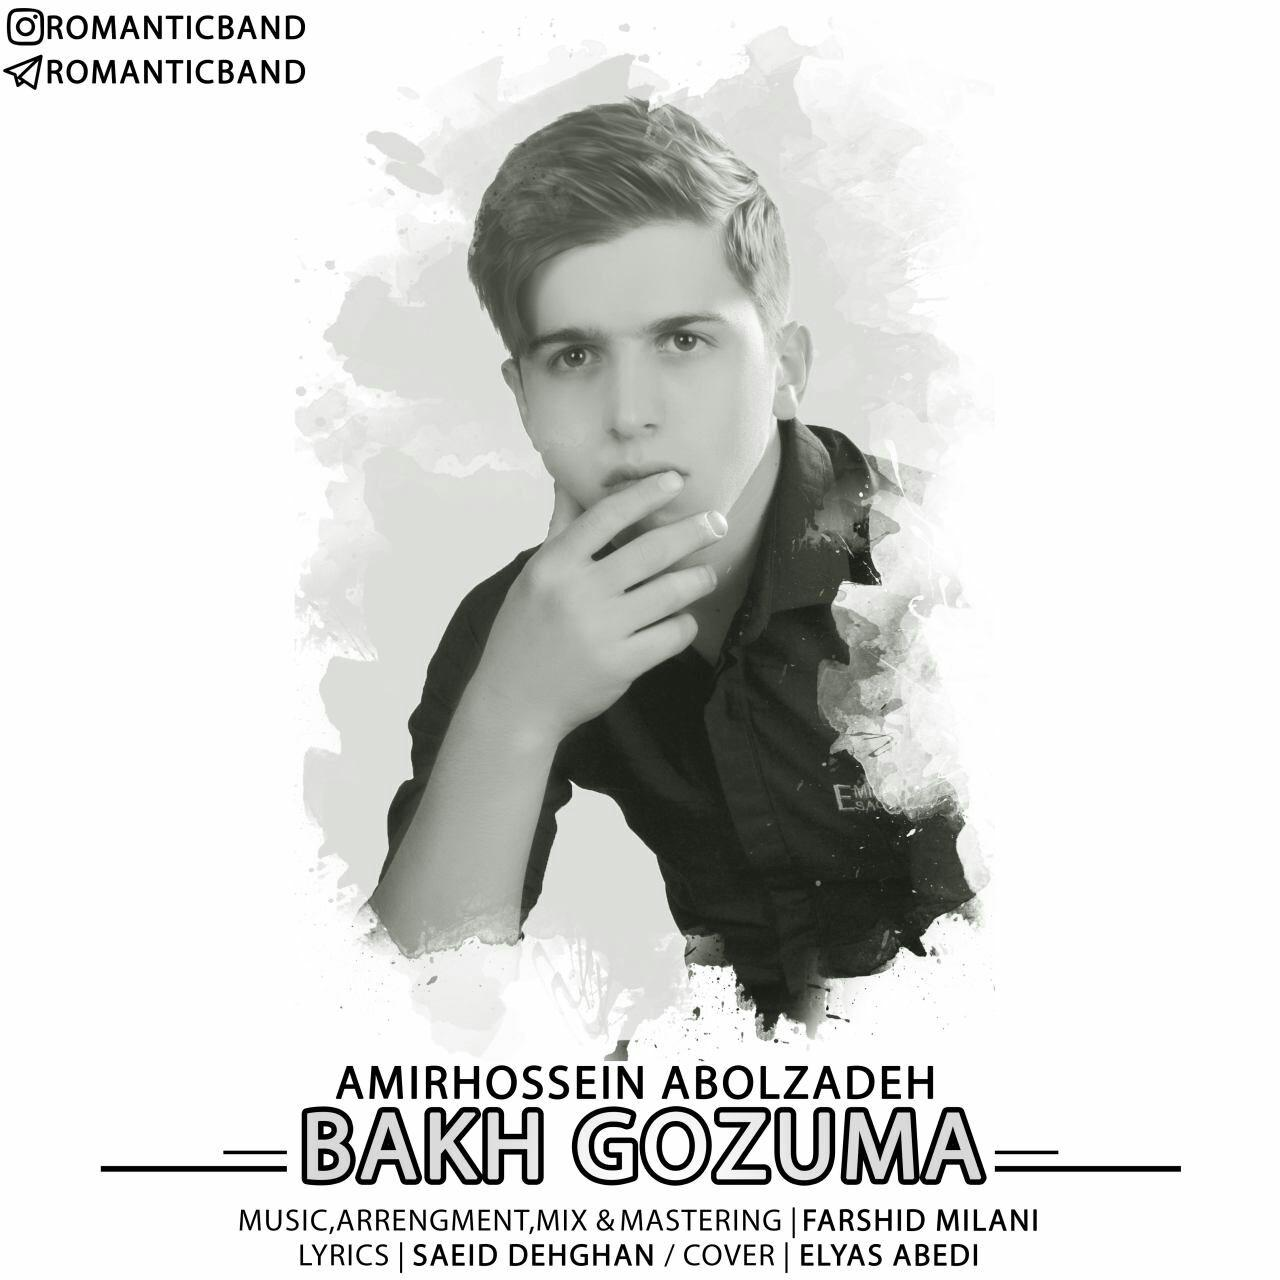 http://s9.picofile.com/file/8326708226/04Amirhossein_Abolzadeh_Bakh_Gozuma.jpg